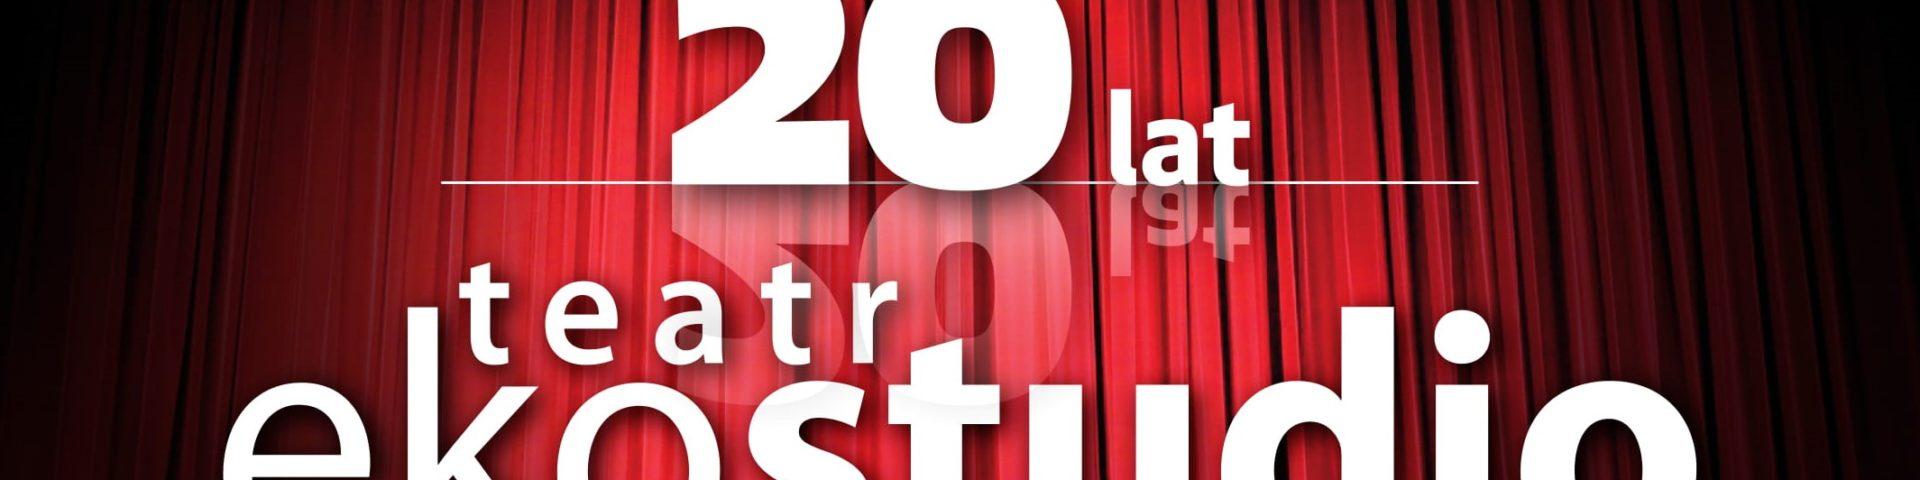 teatr, 20 lat teatru, wydarzenie, Opolski teatr, Teatr w Opolu, jubileusz teatru,